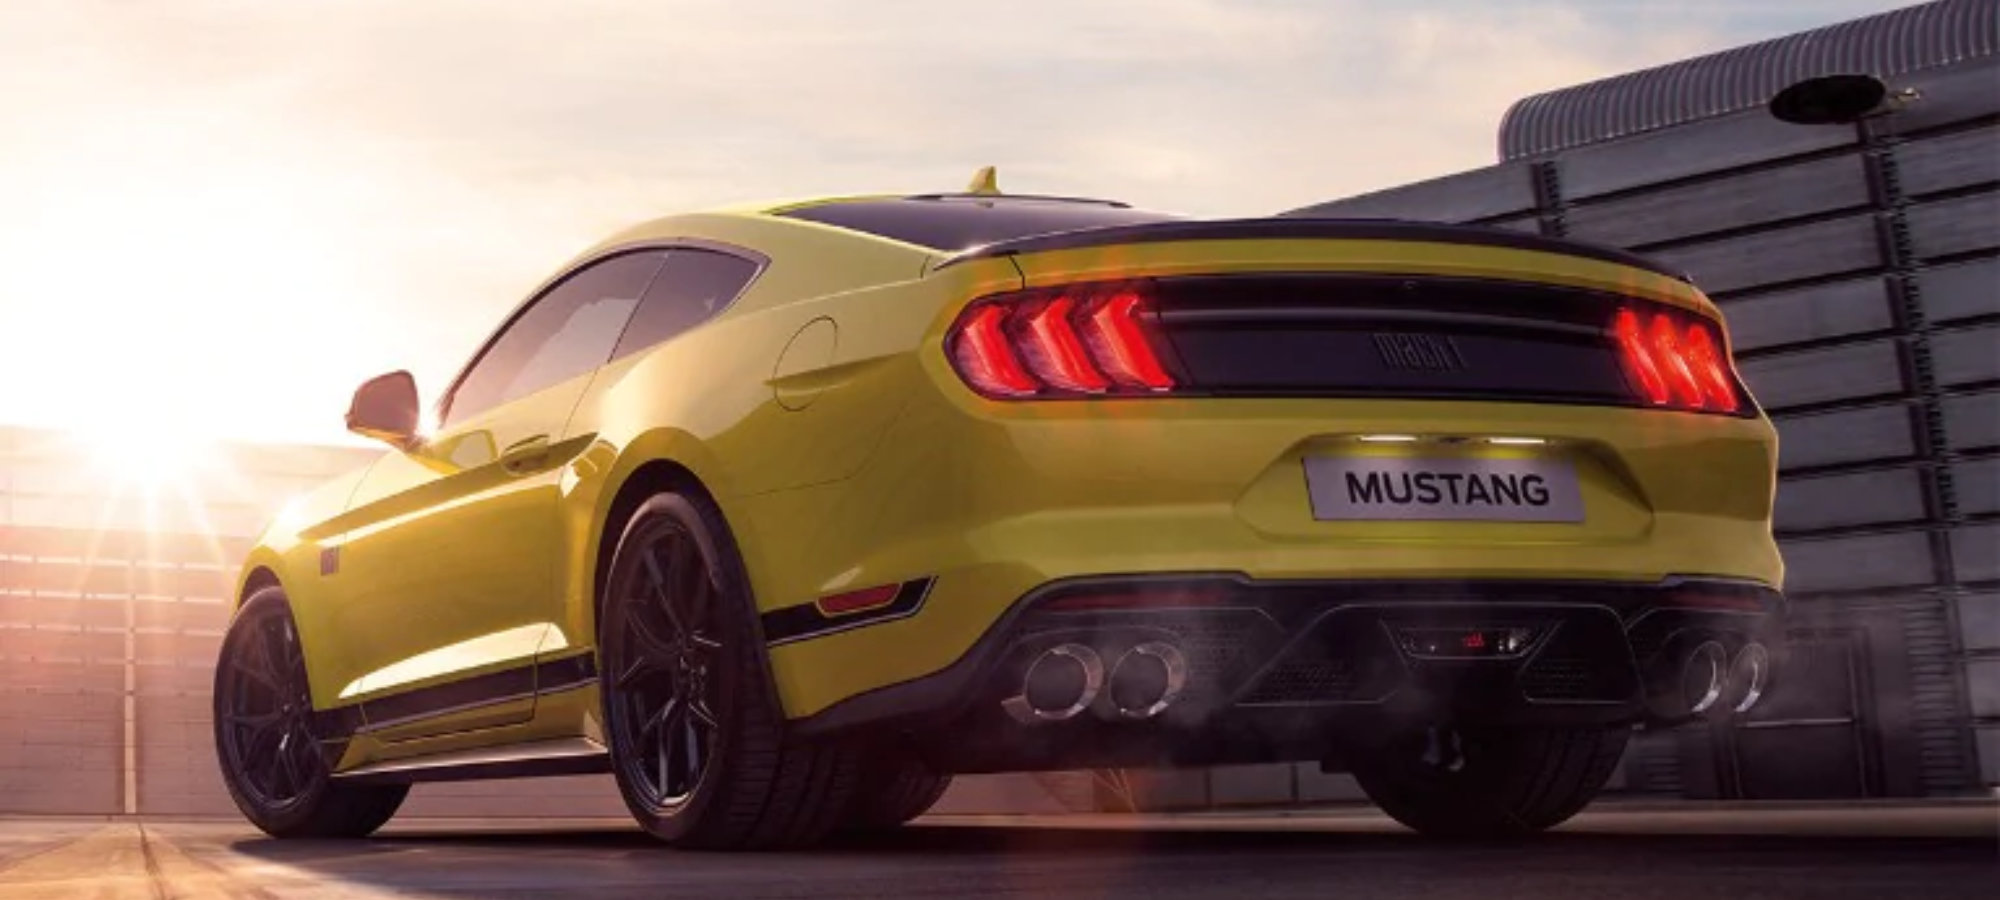 Mustang Mach 1 gul